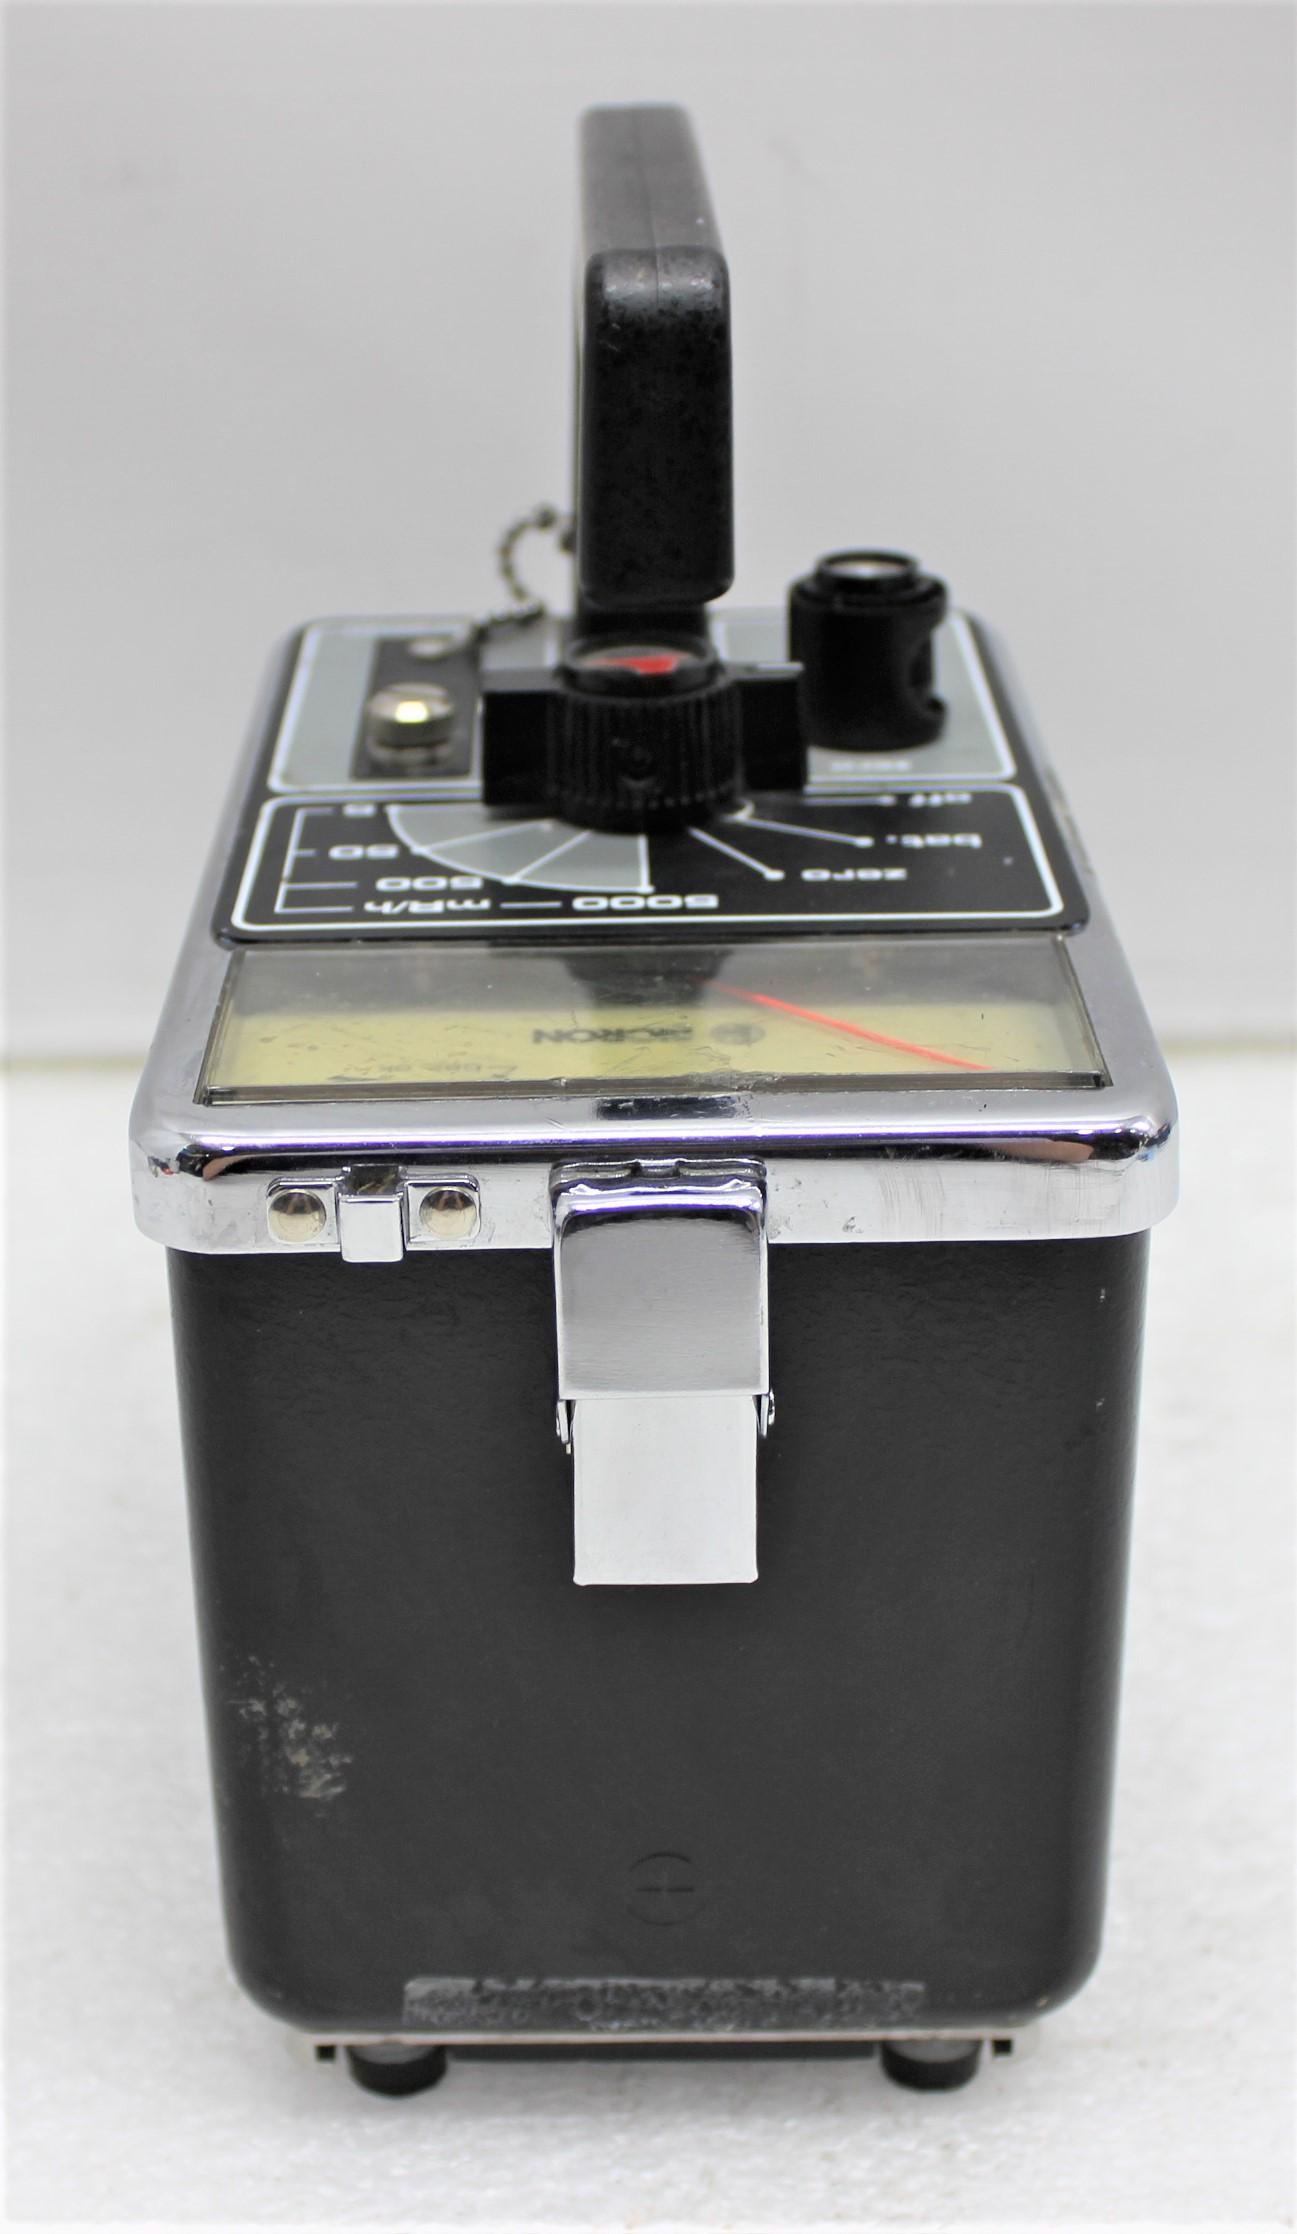 Image BICRON RSO-5 Portable Survey Meter 1587245